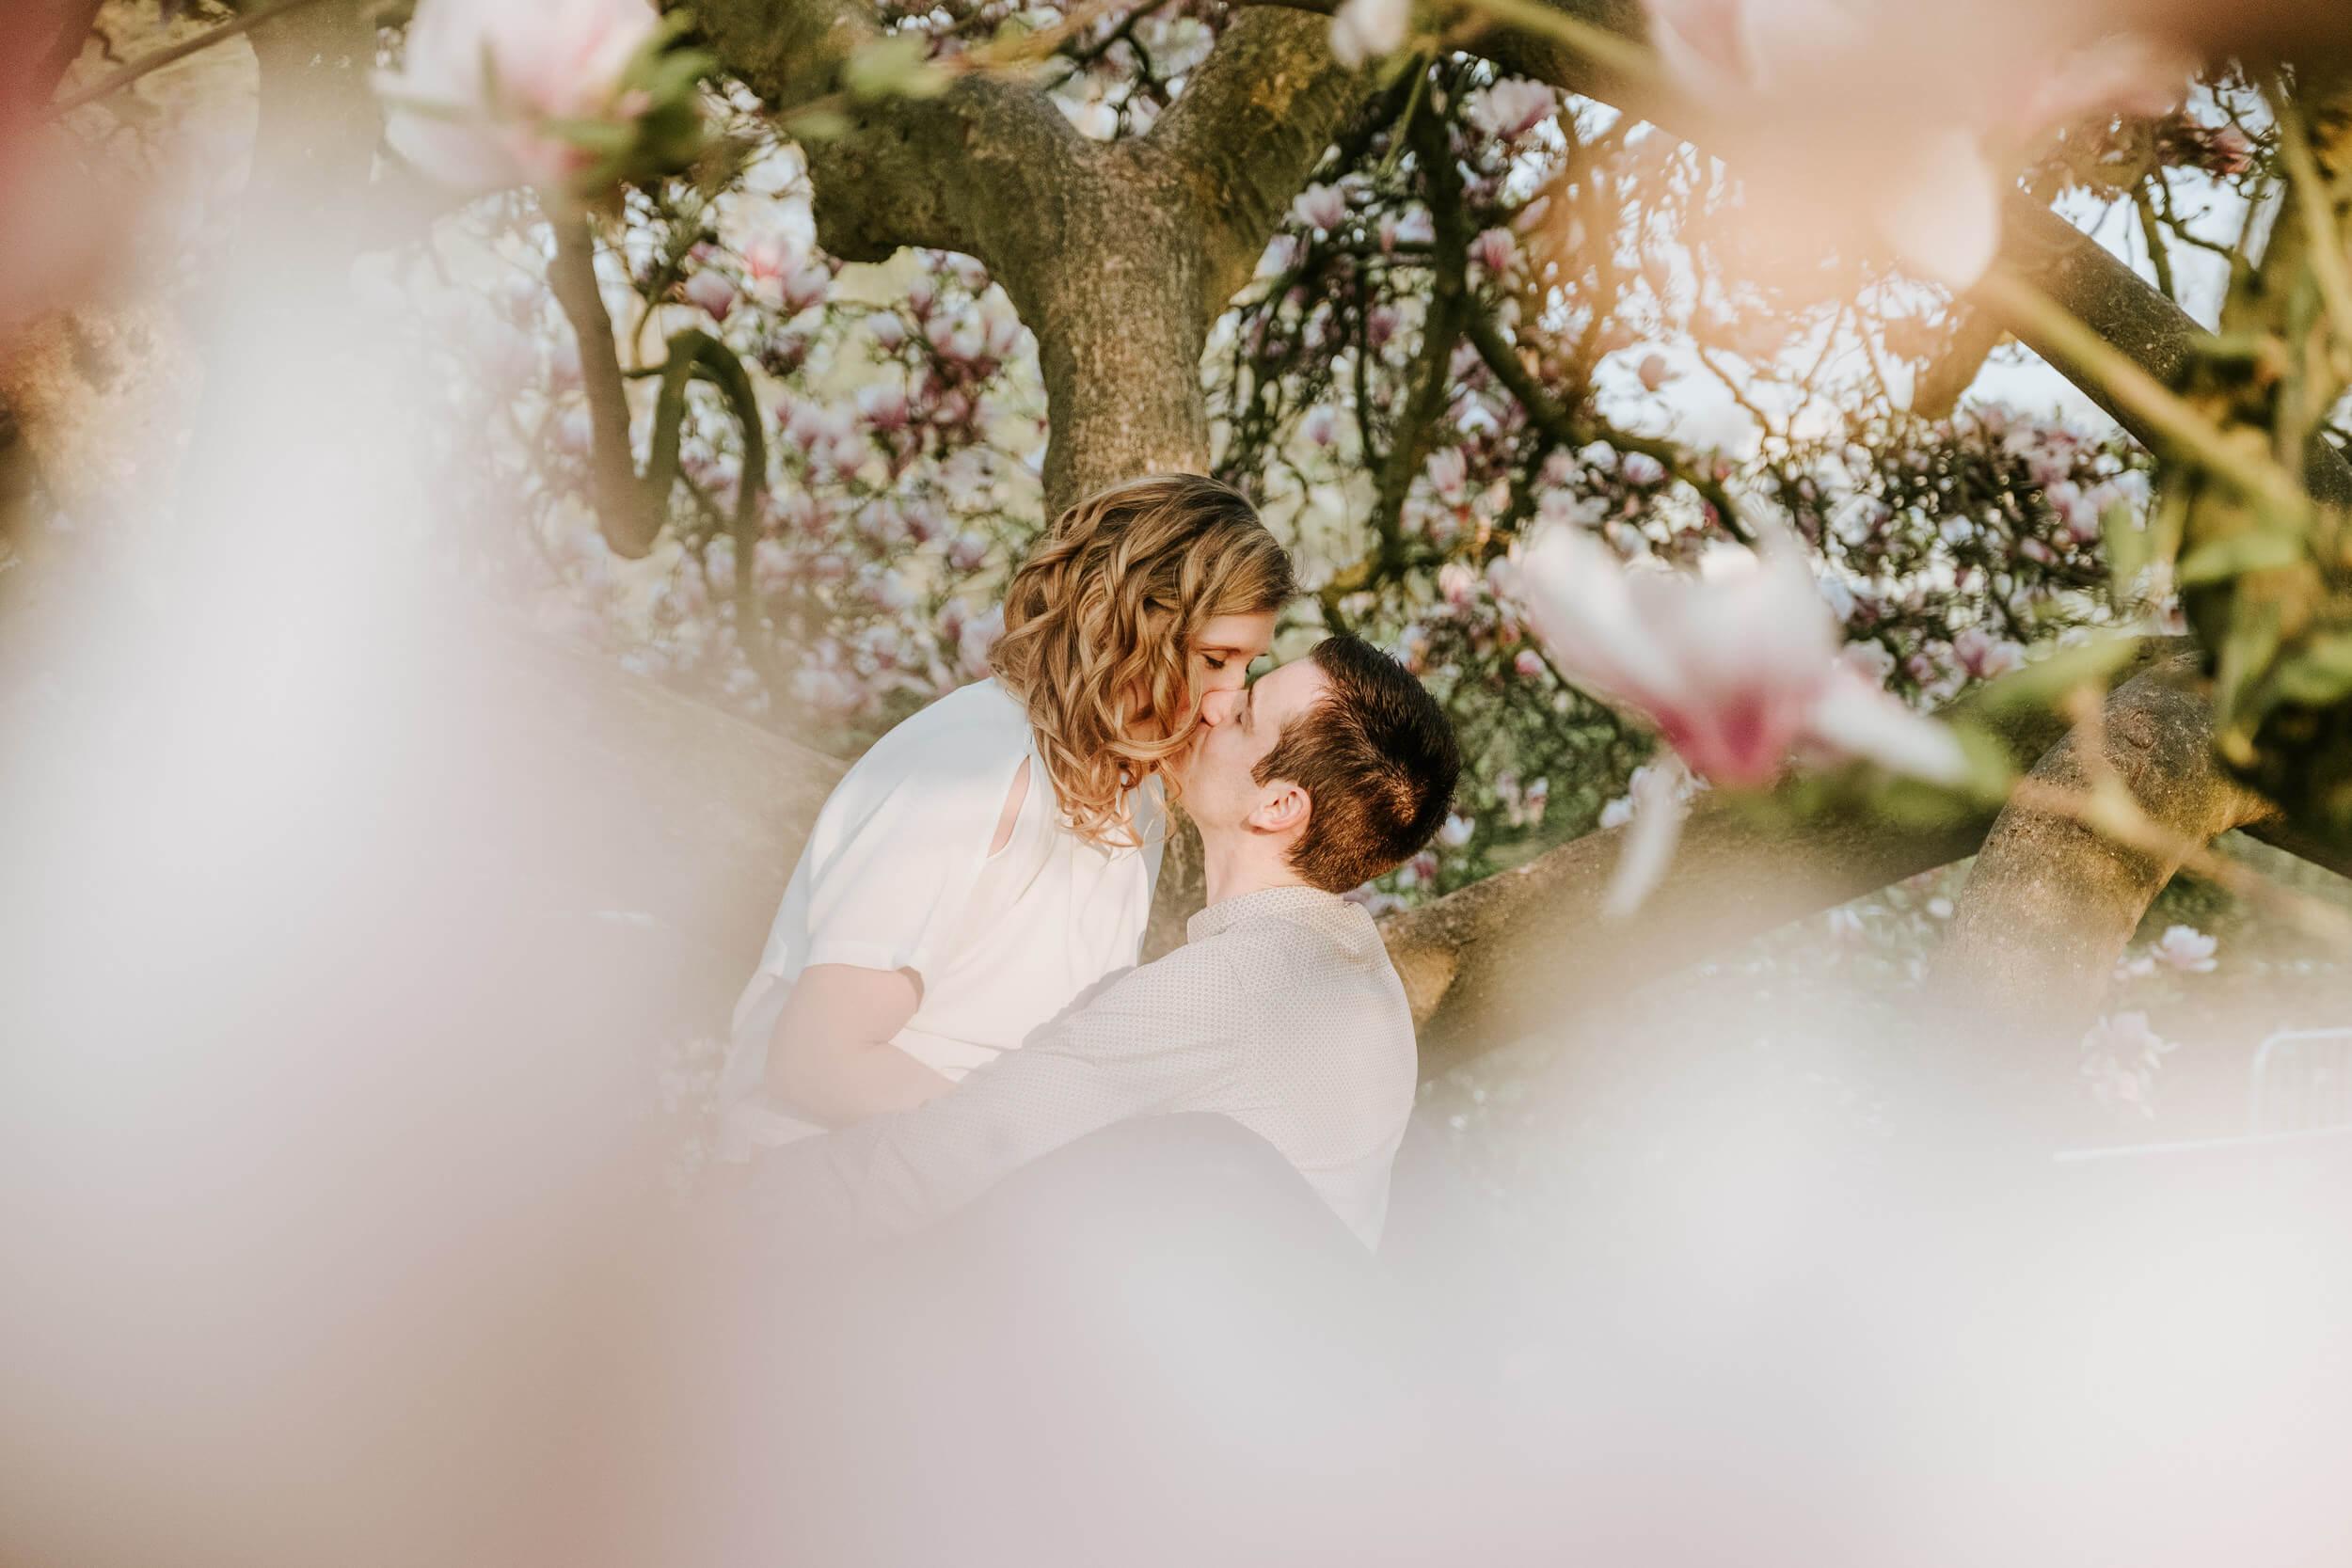 Verloving-Engagement-Vlooybergtoren-Hoegaarden-Tielt-Alternatief-17.JPG